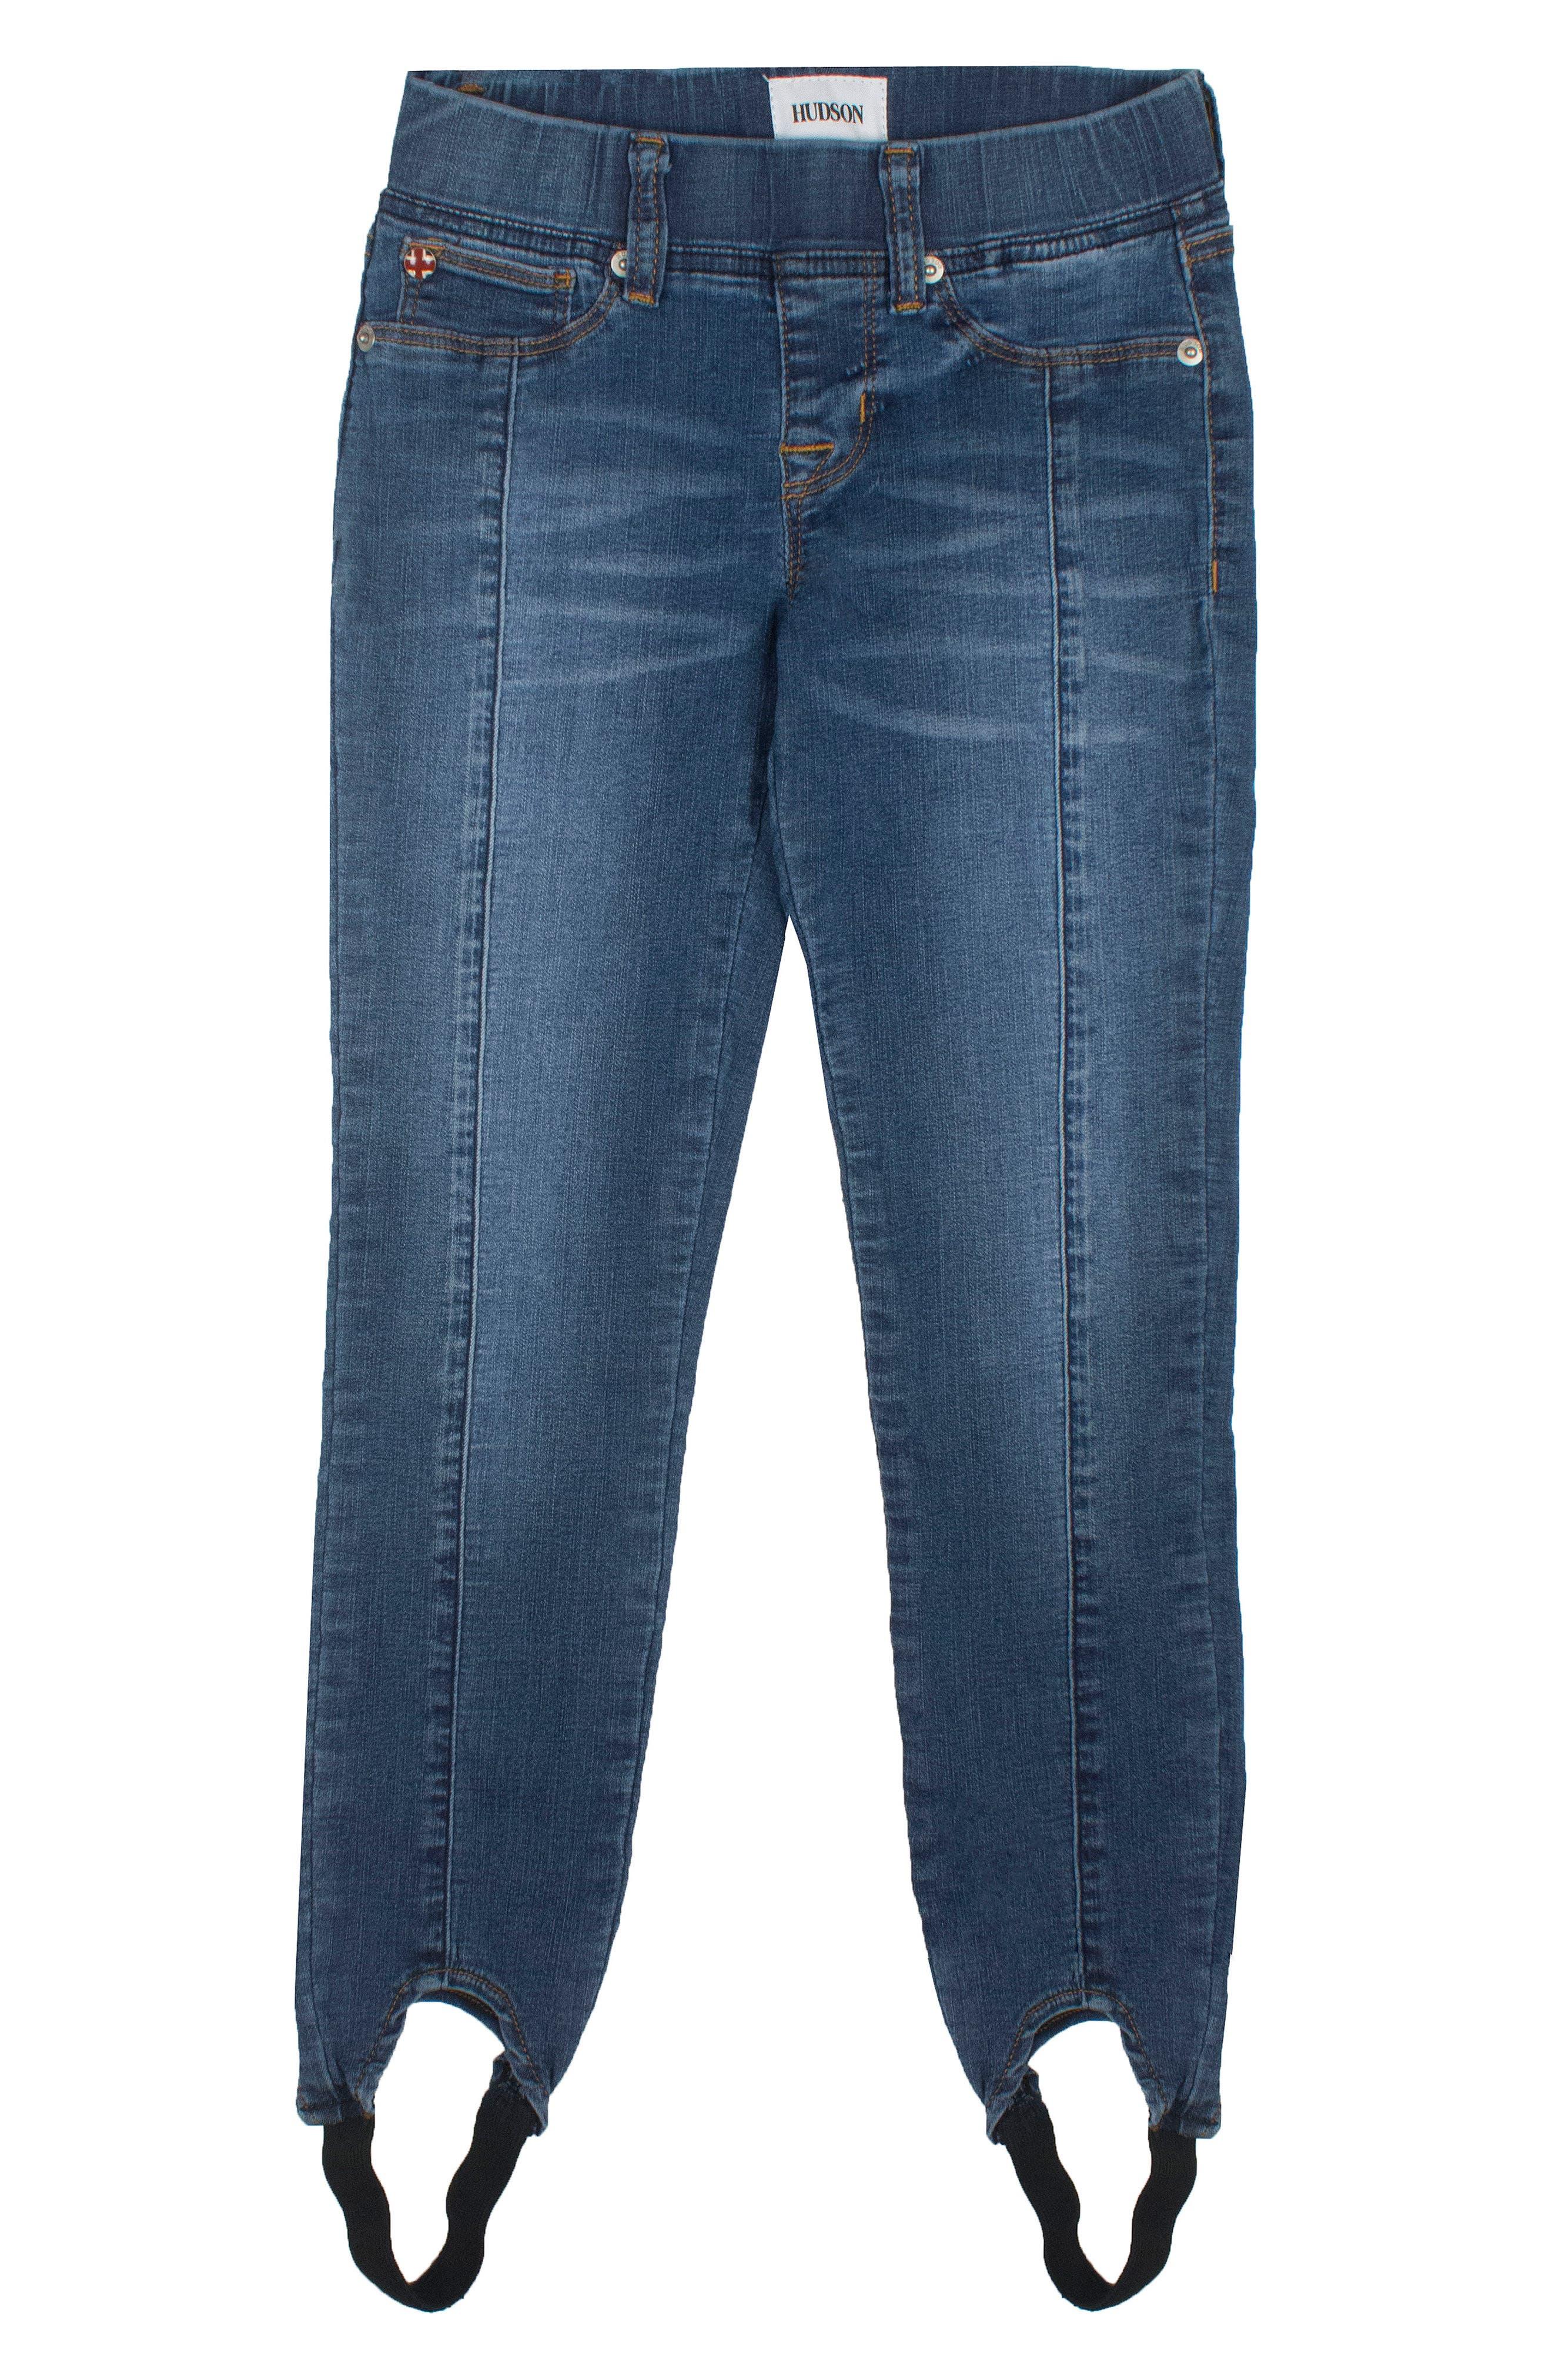 Rosa Stirrup Jeans,                             Main thumbnail 1, color,                             493